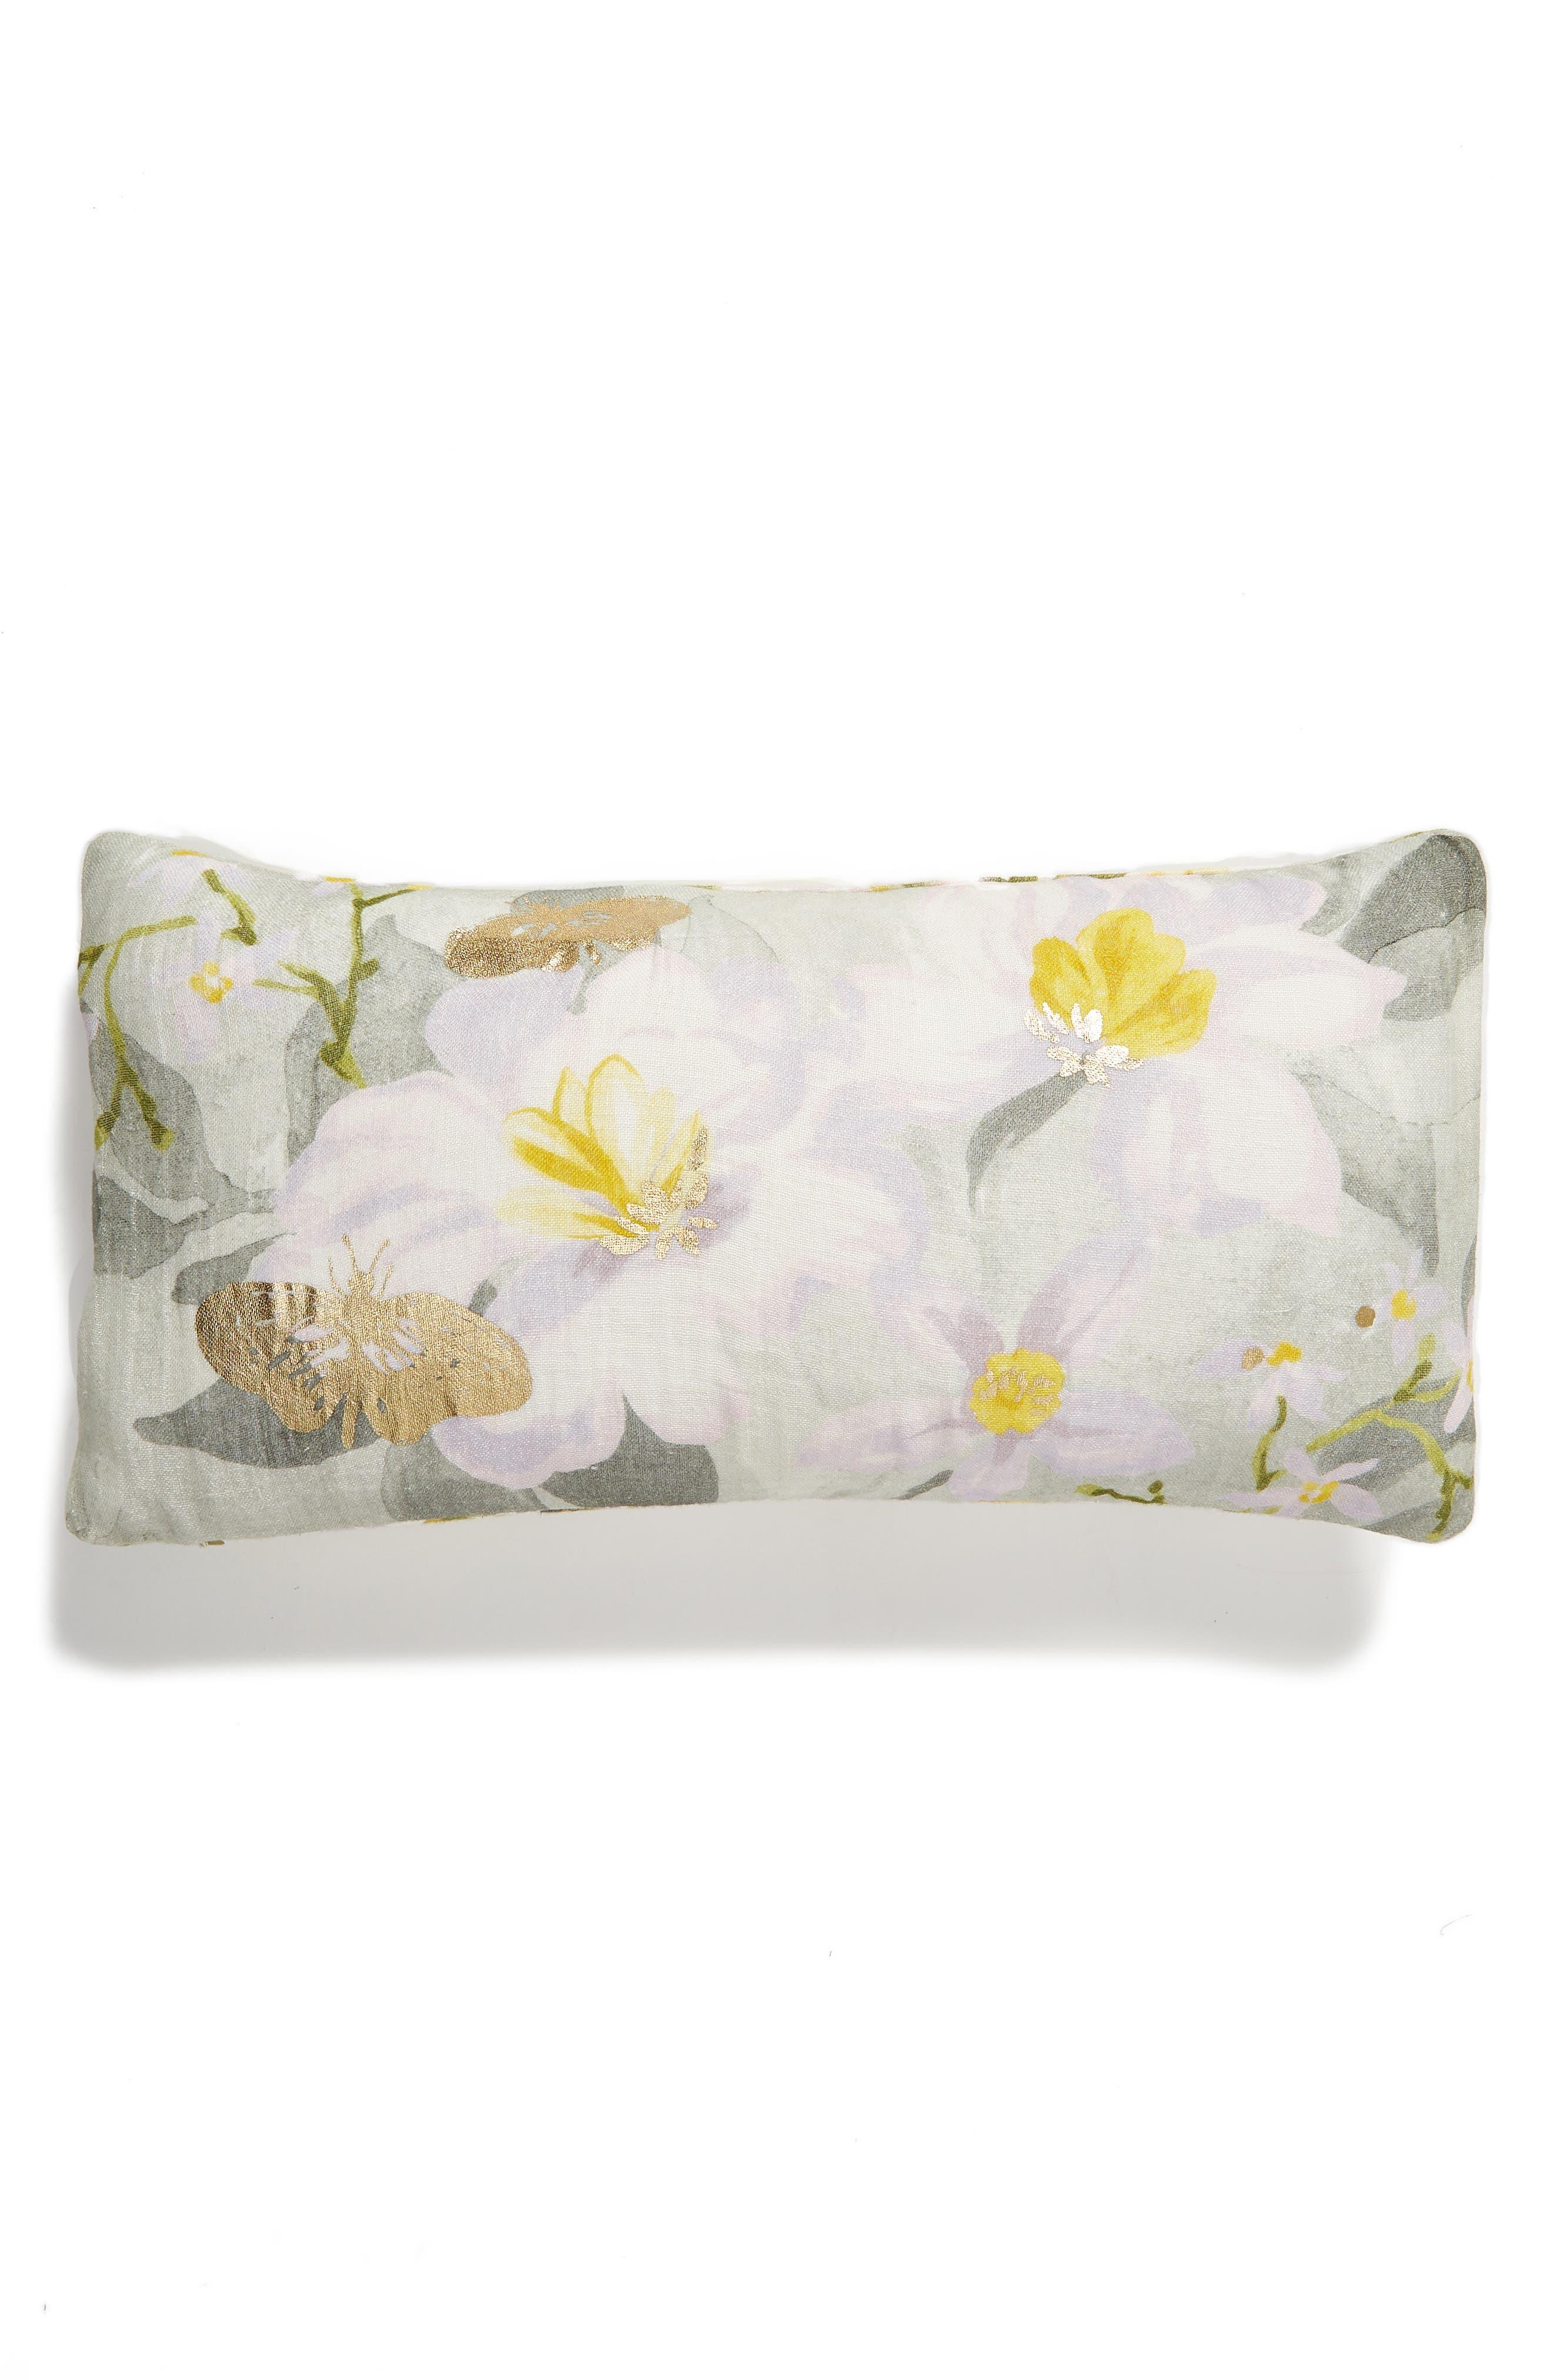 NORDSTROM AT HOME Floral Linen Accent Pillow, Main, color, GREY VAPOR MULTI